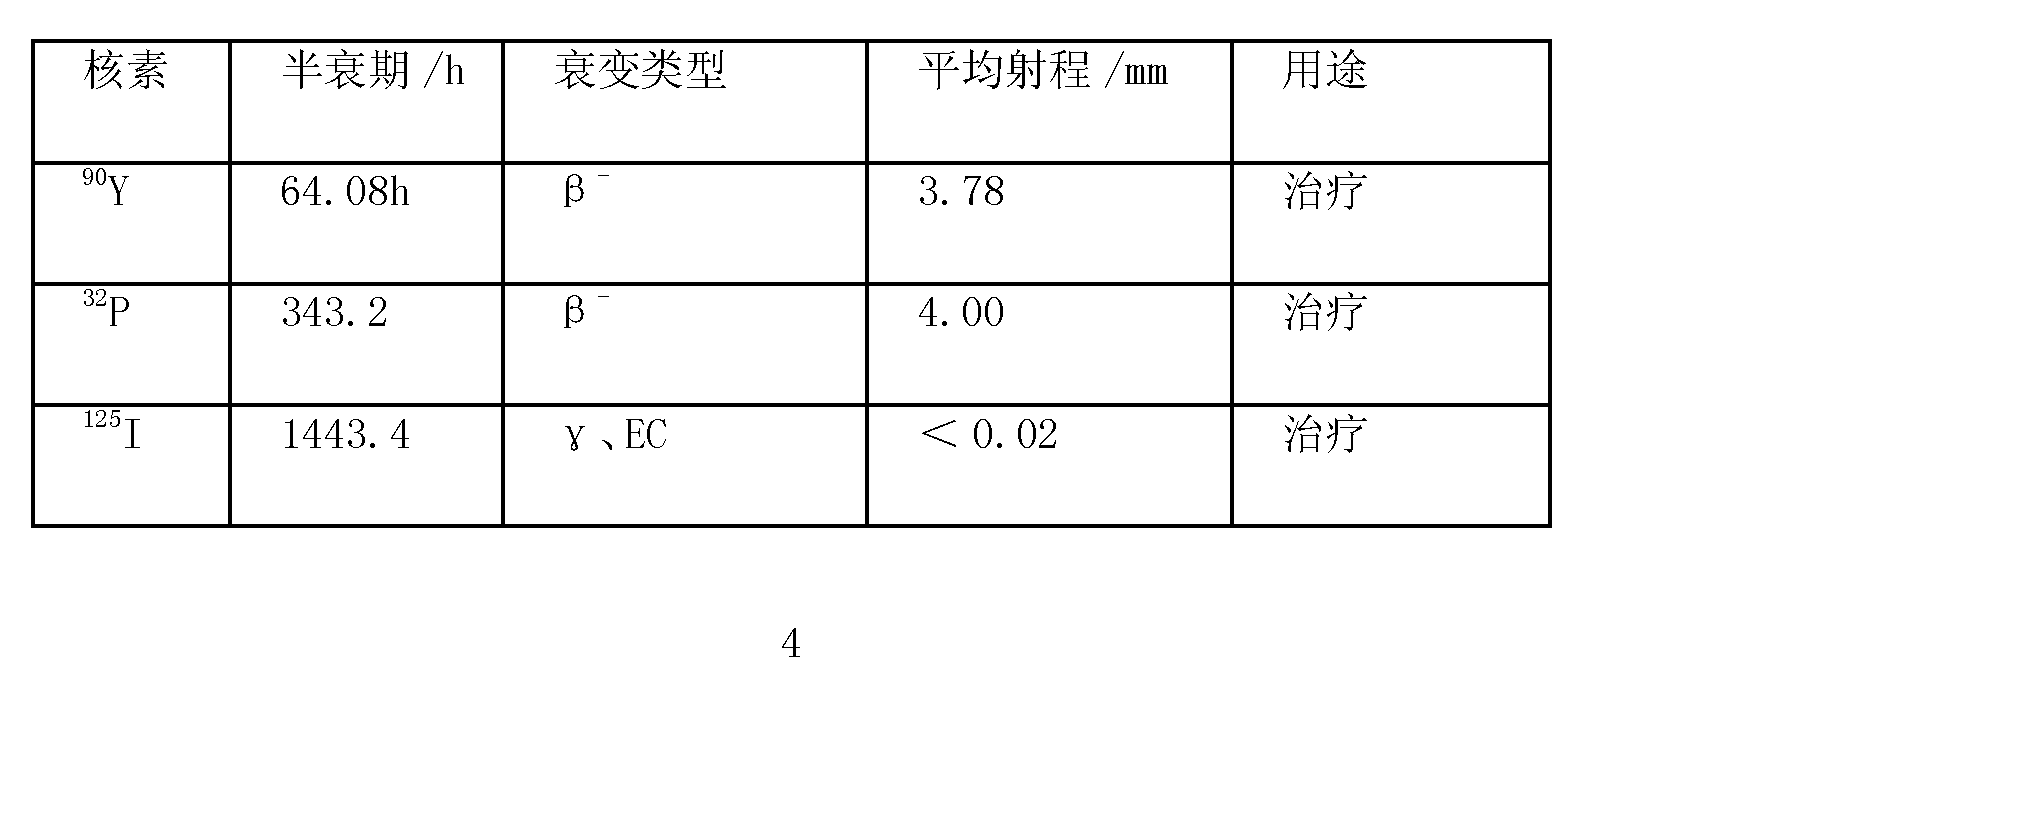 CN102671219A - 一種放射性陰離子樹脂微球及其制備方法(1) - Google Patents